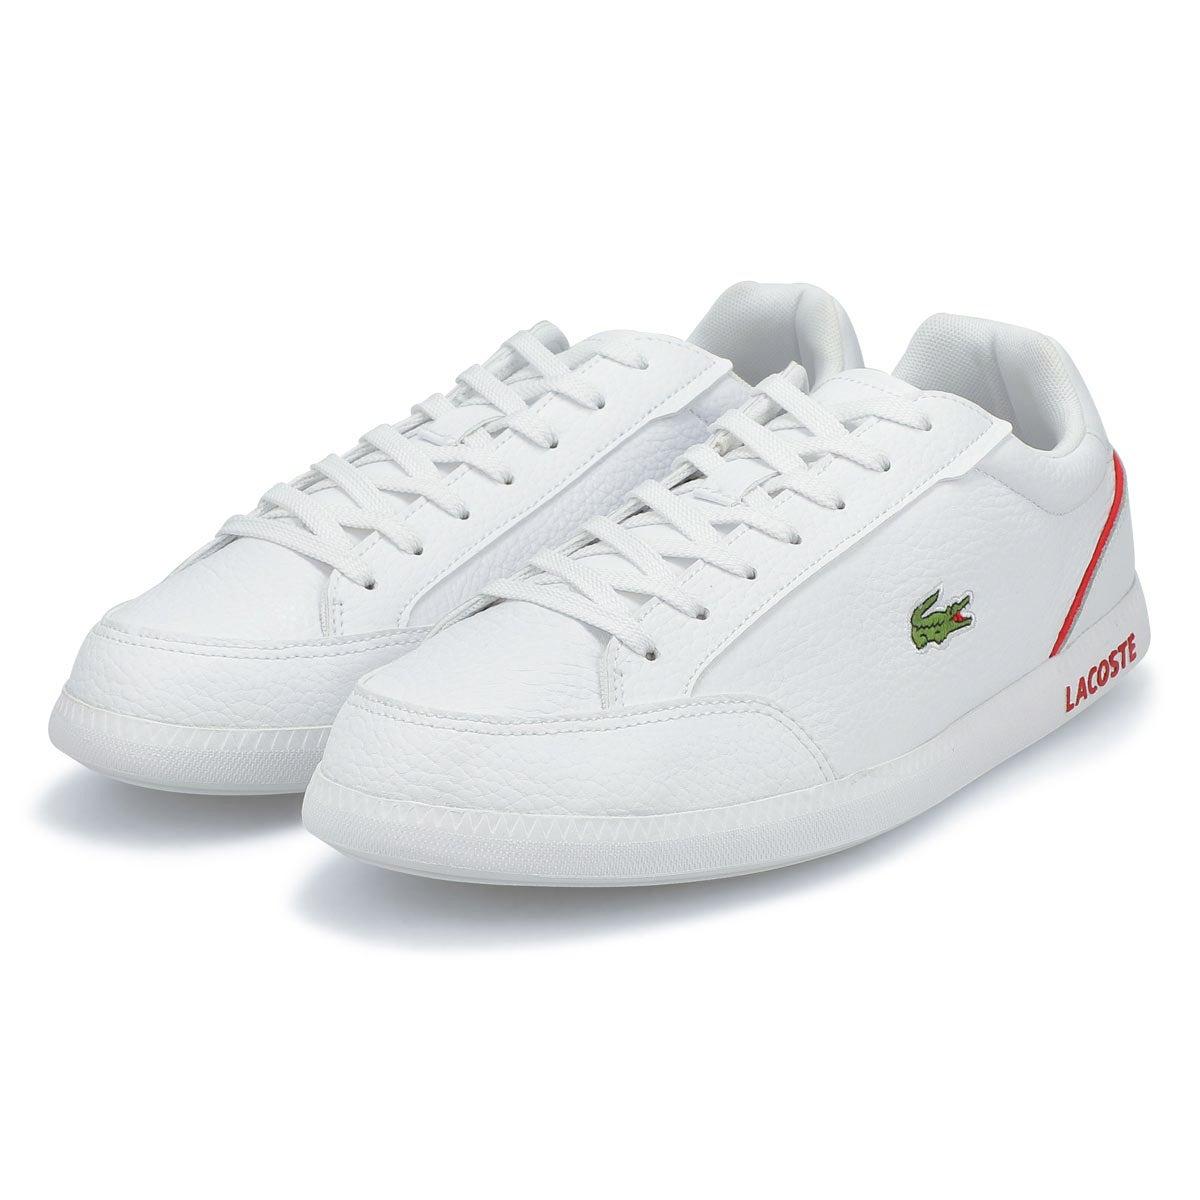 Men's Graduate Cap 0721 1 Sneaker -White/Red